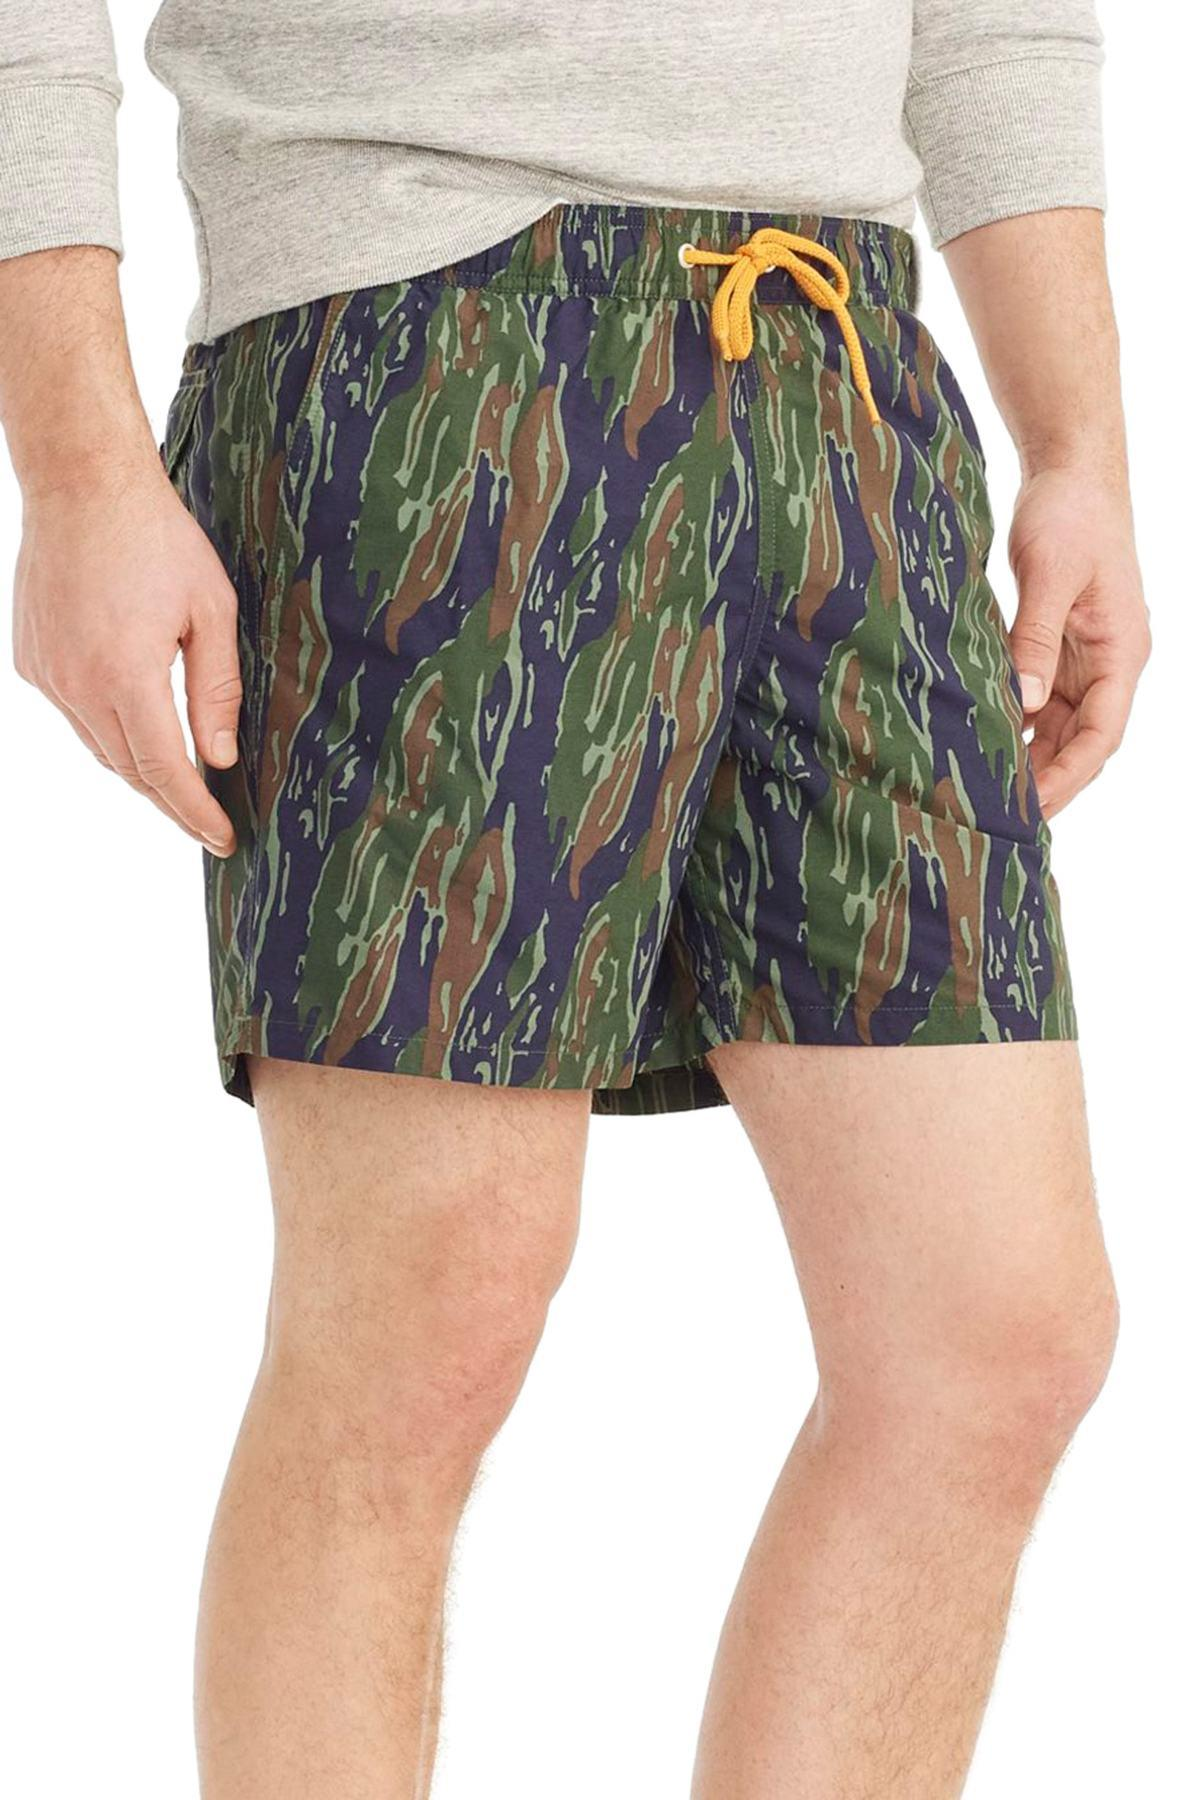 O Ginkgo Mens Beach Shorts Swim Trunks Outdoor Shorts Running Shorts